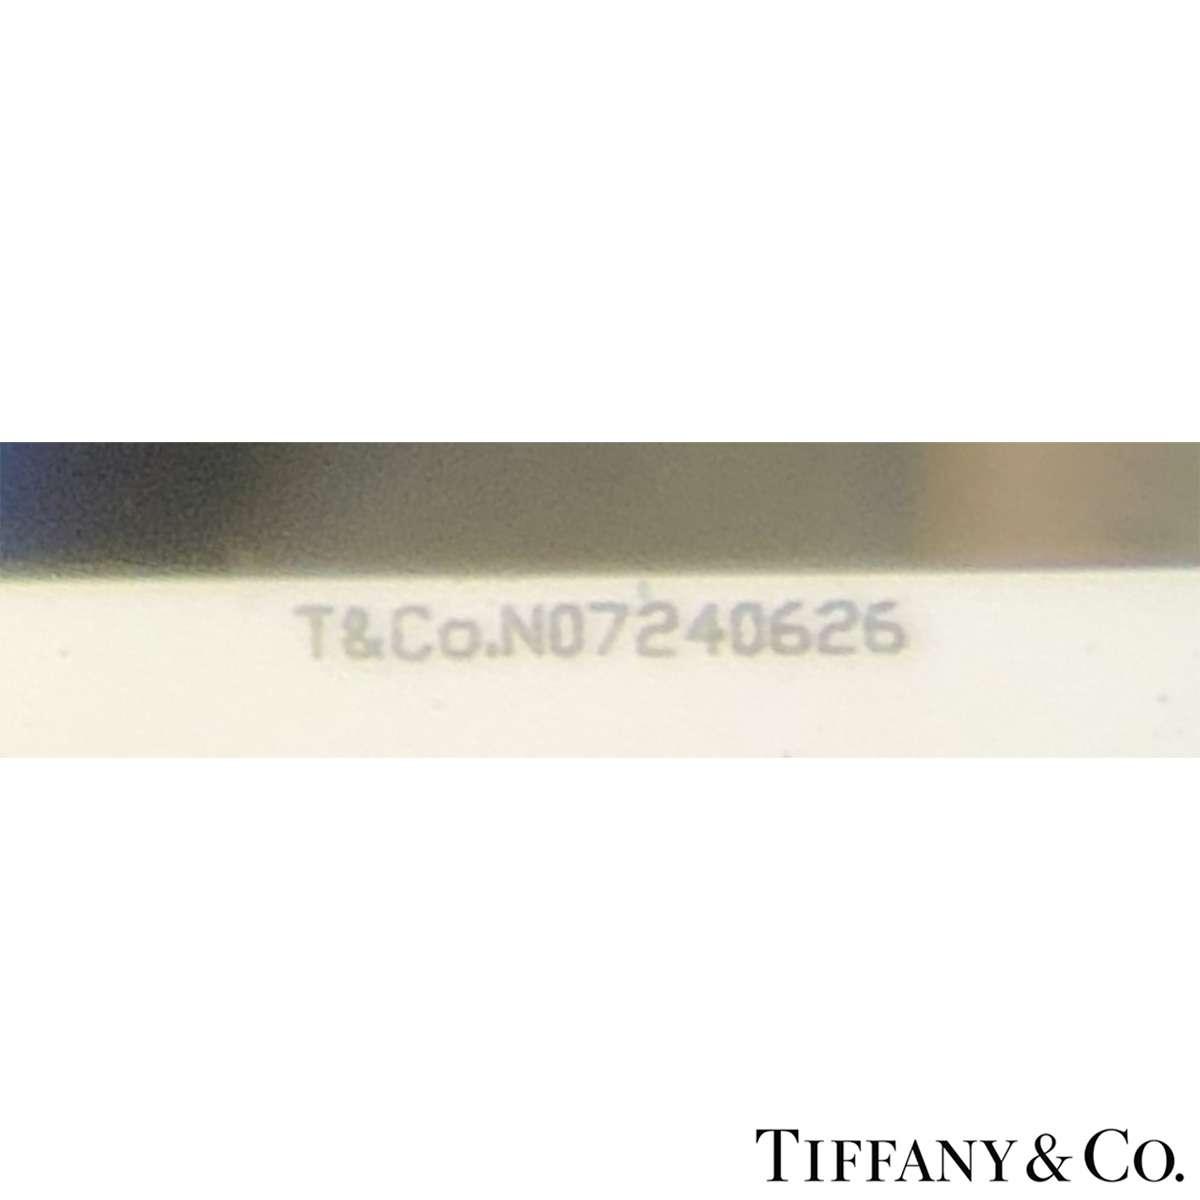 Tiffany & Co. Round Brilliant Cut Diamond Ring 1.06ct G/VS1